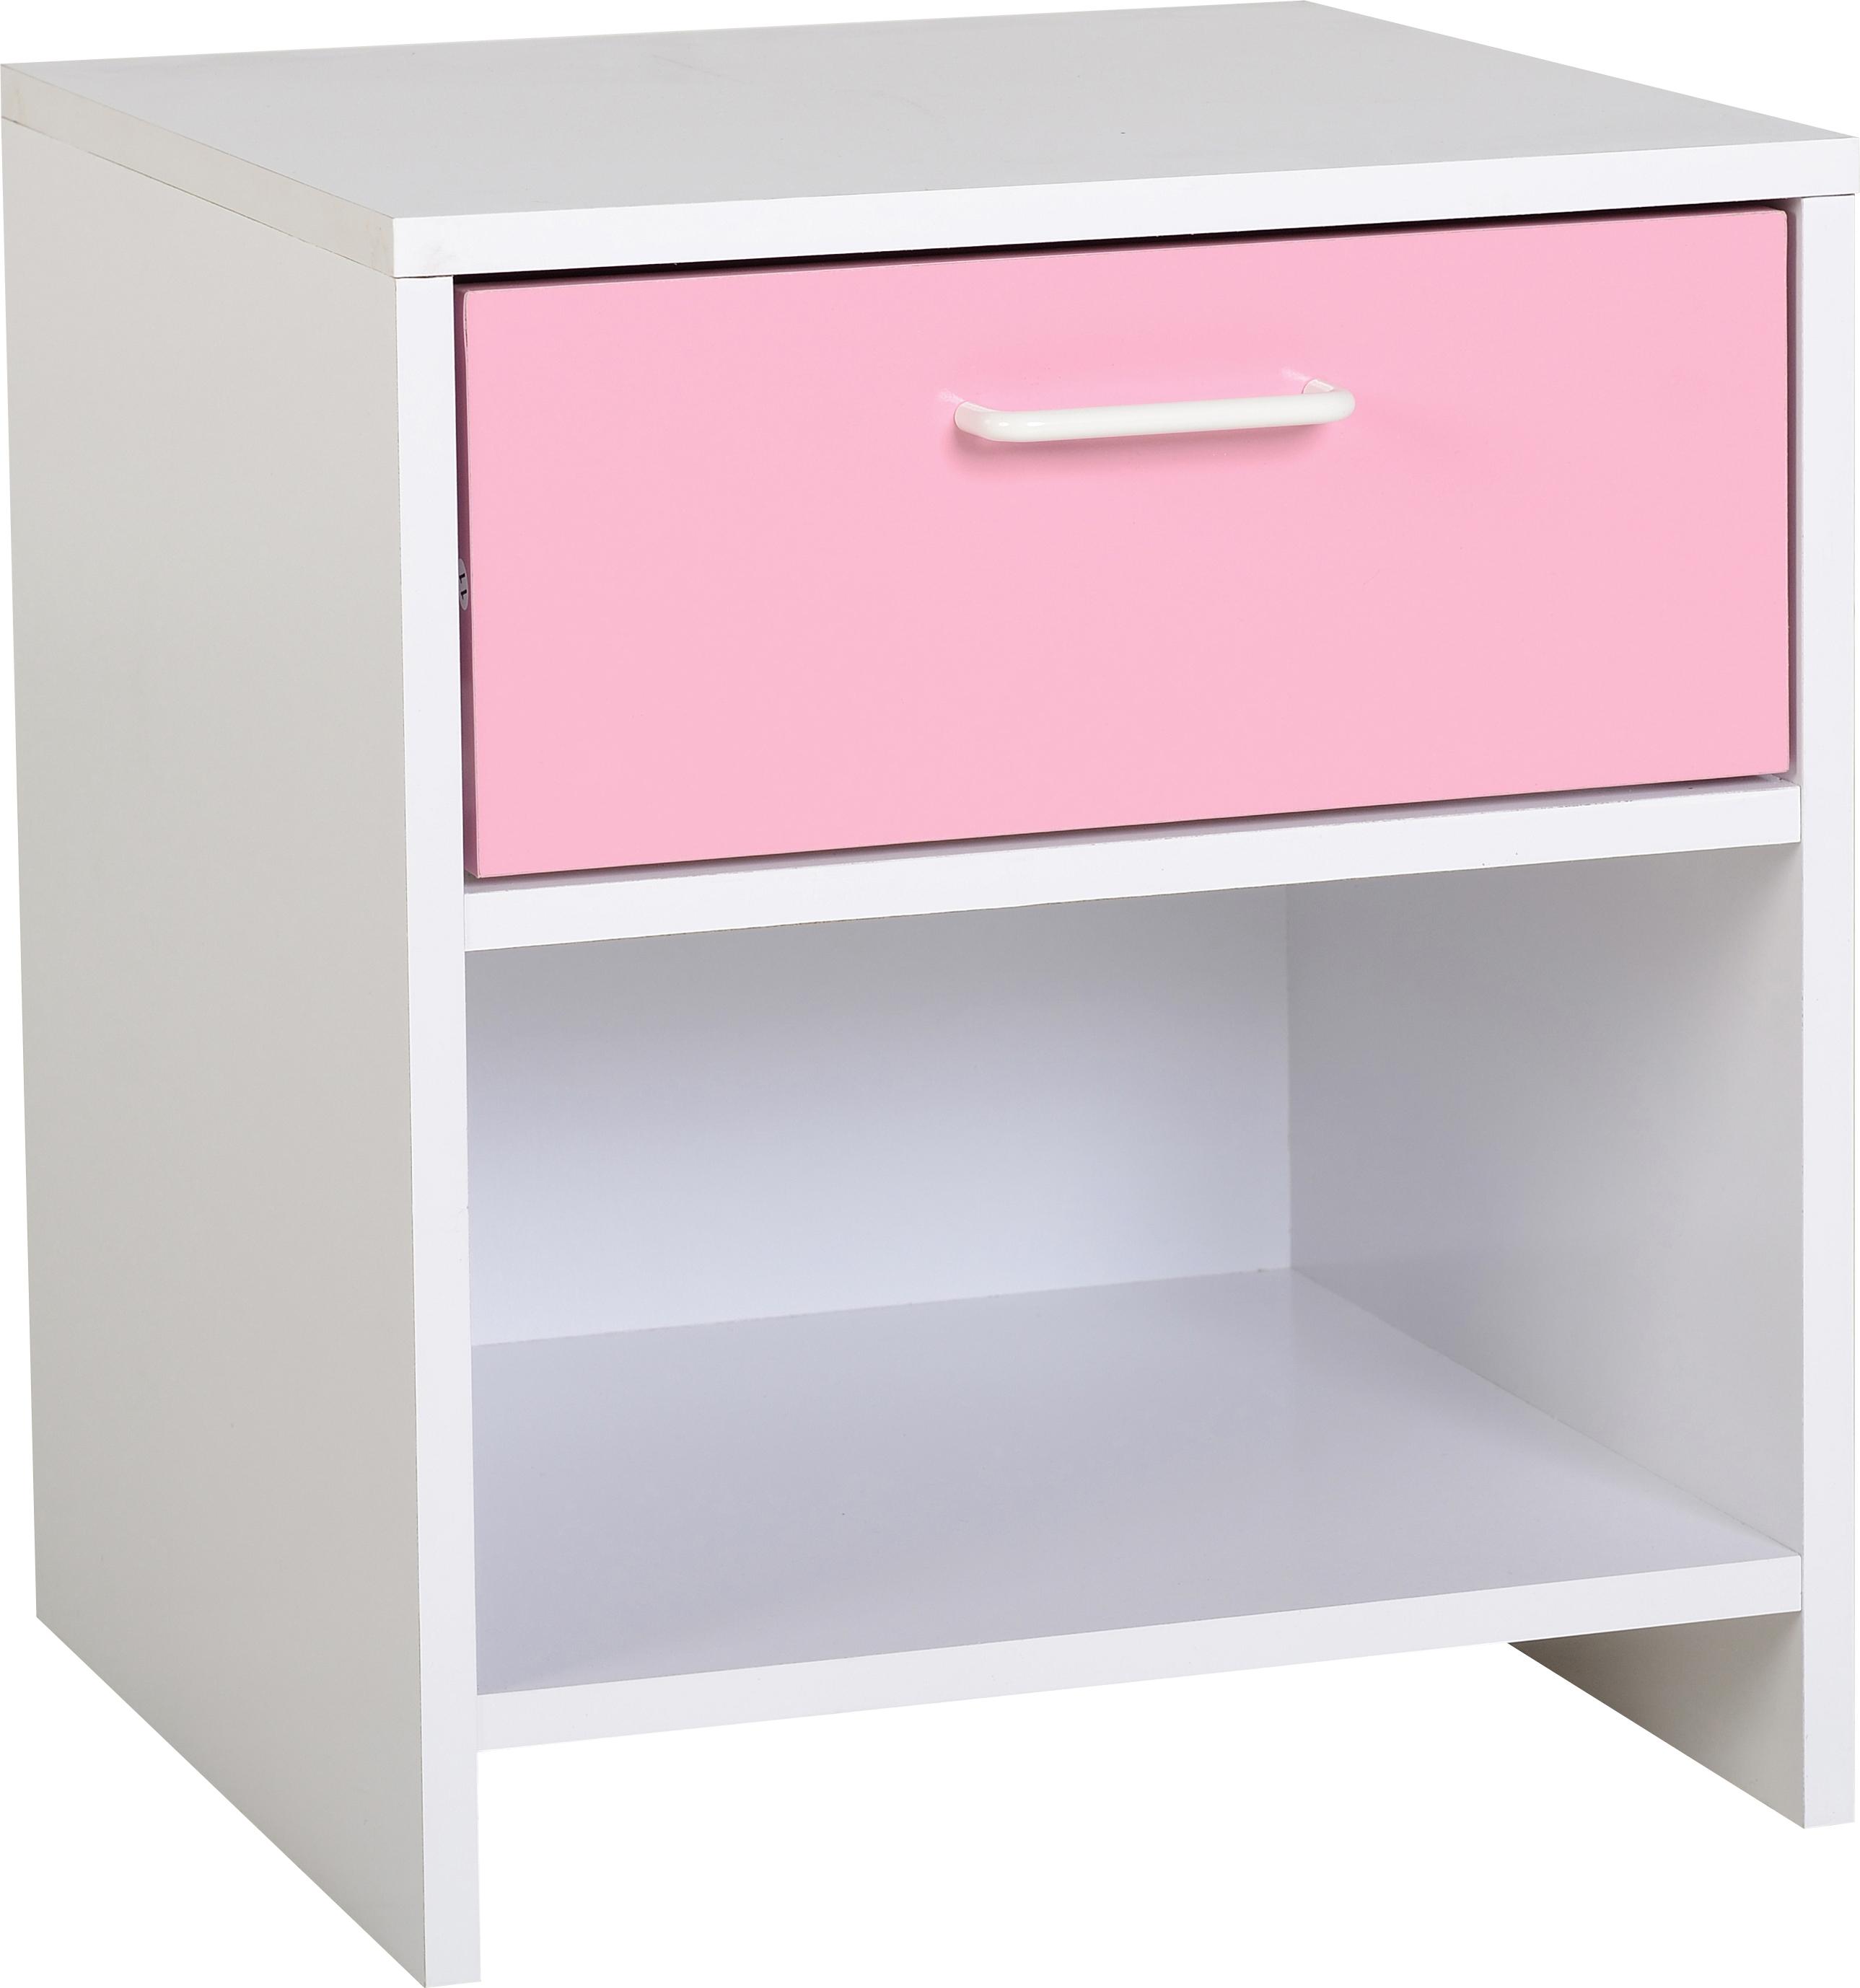 Lollipop Bedside Pink 01